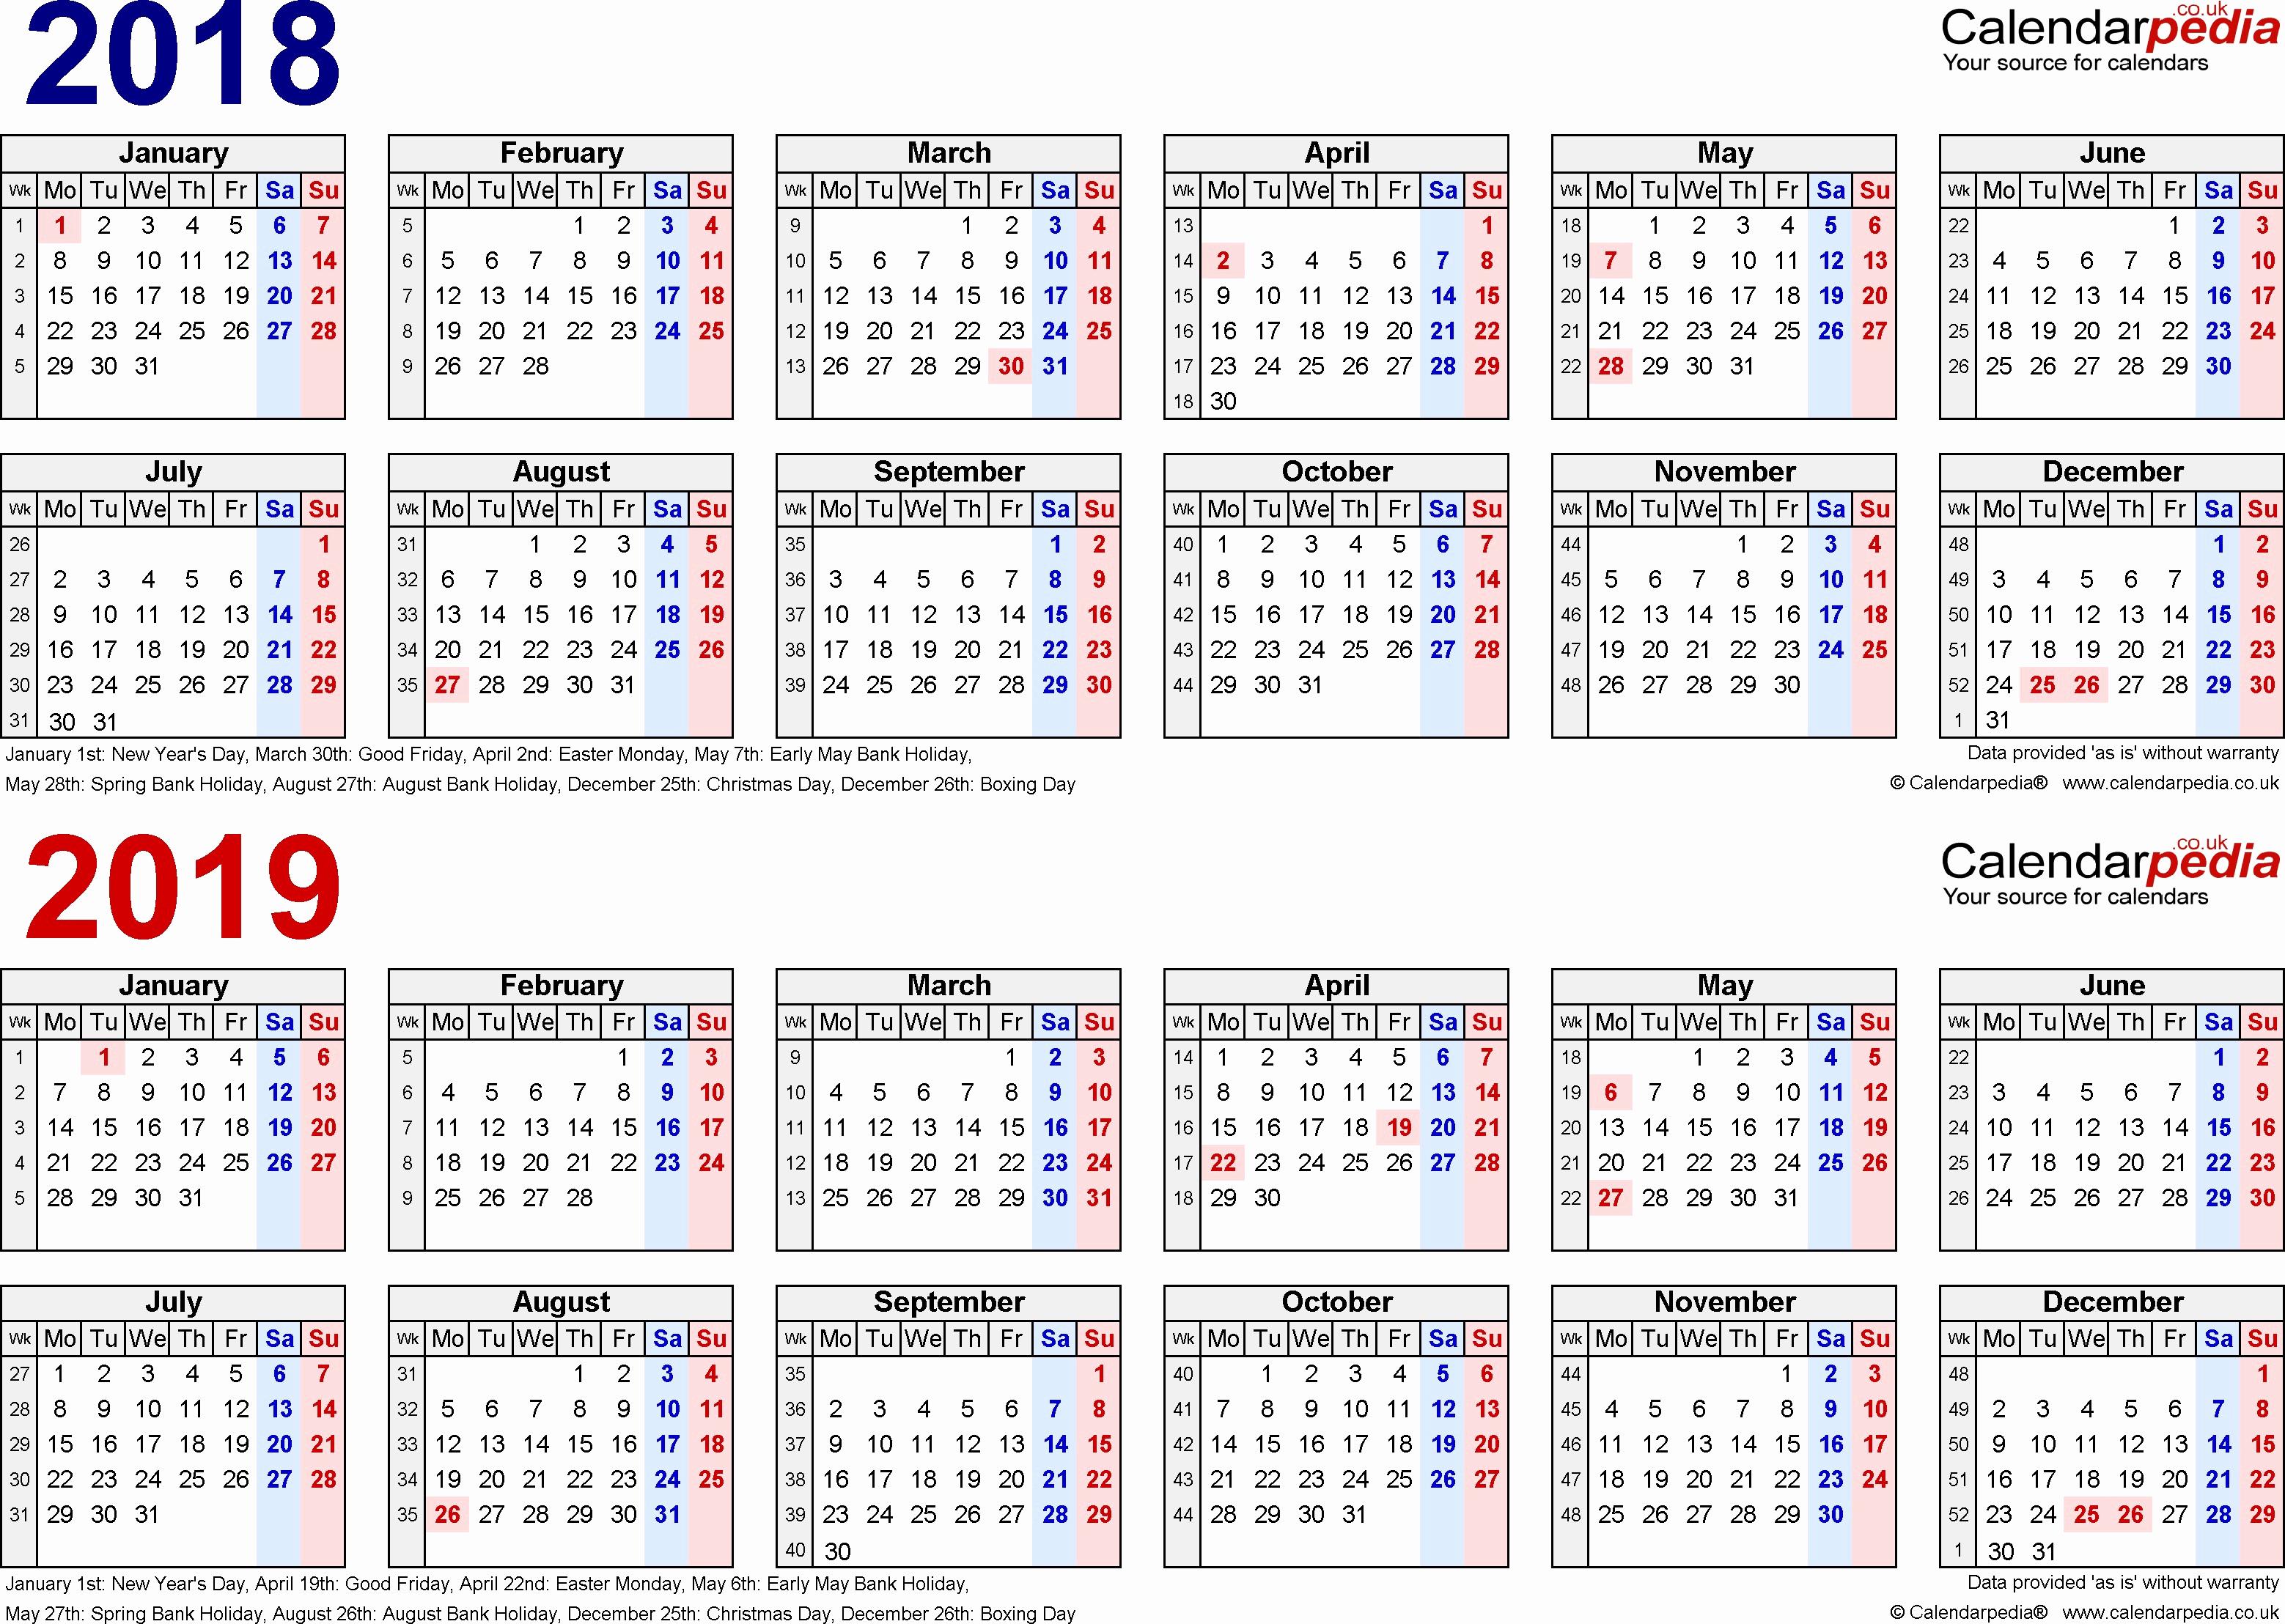 2019 Biweekly Payroll Calendar Template Luxury Pay Period Calendar Bi Weekly 2018